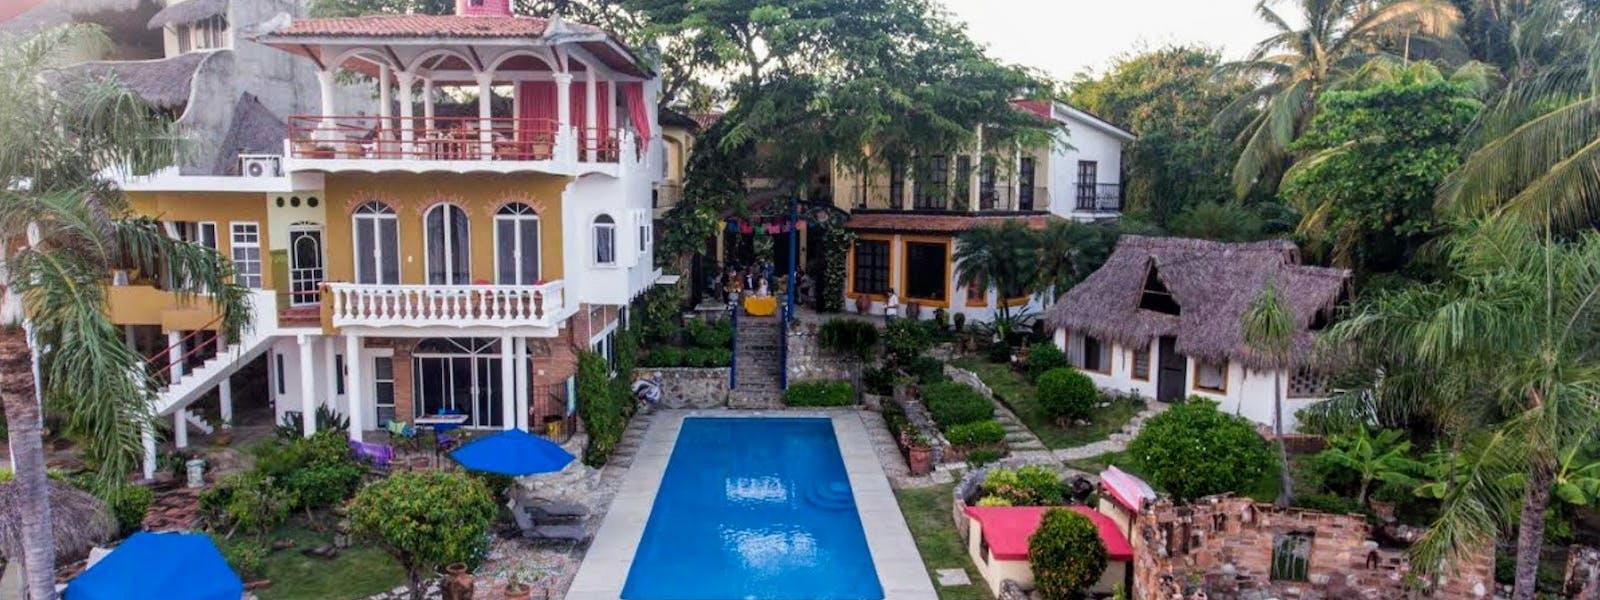 Home Jardin Del Mar